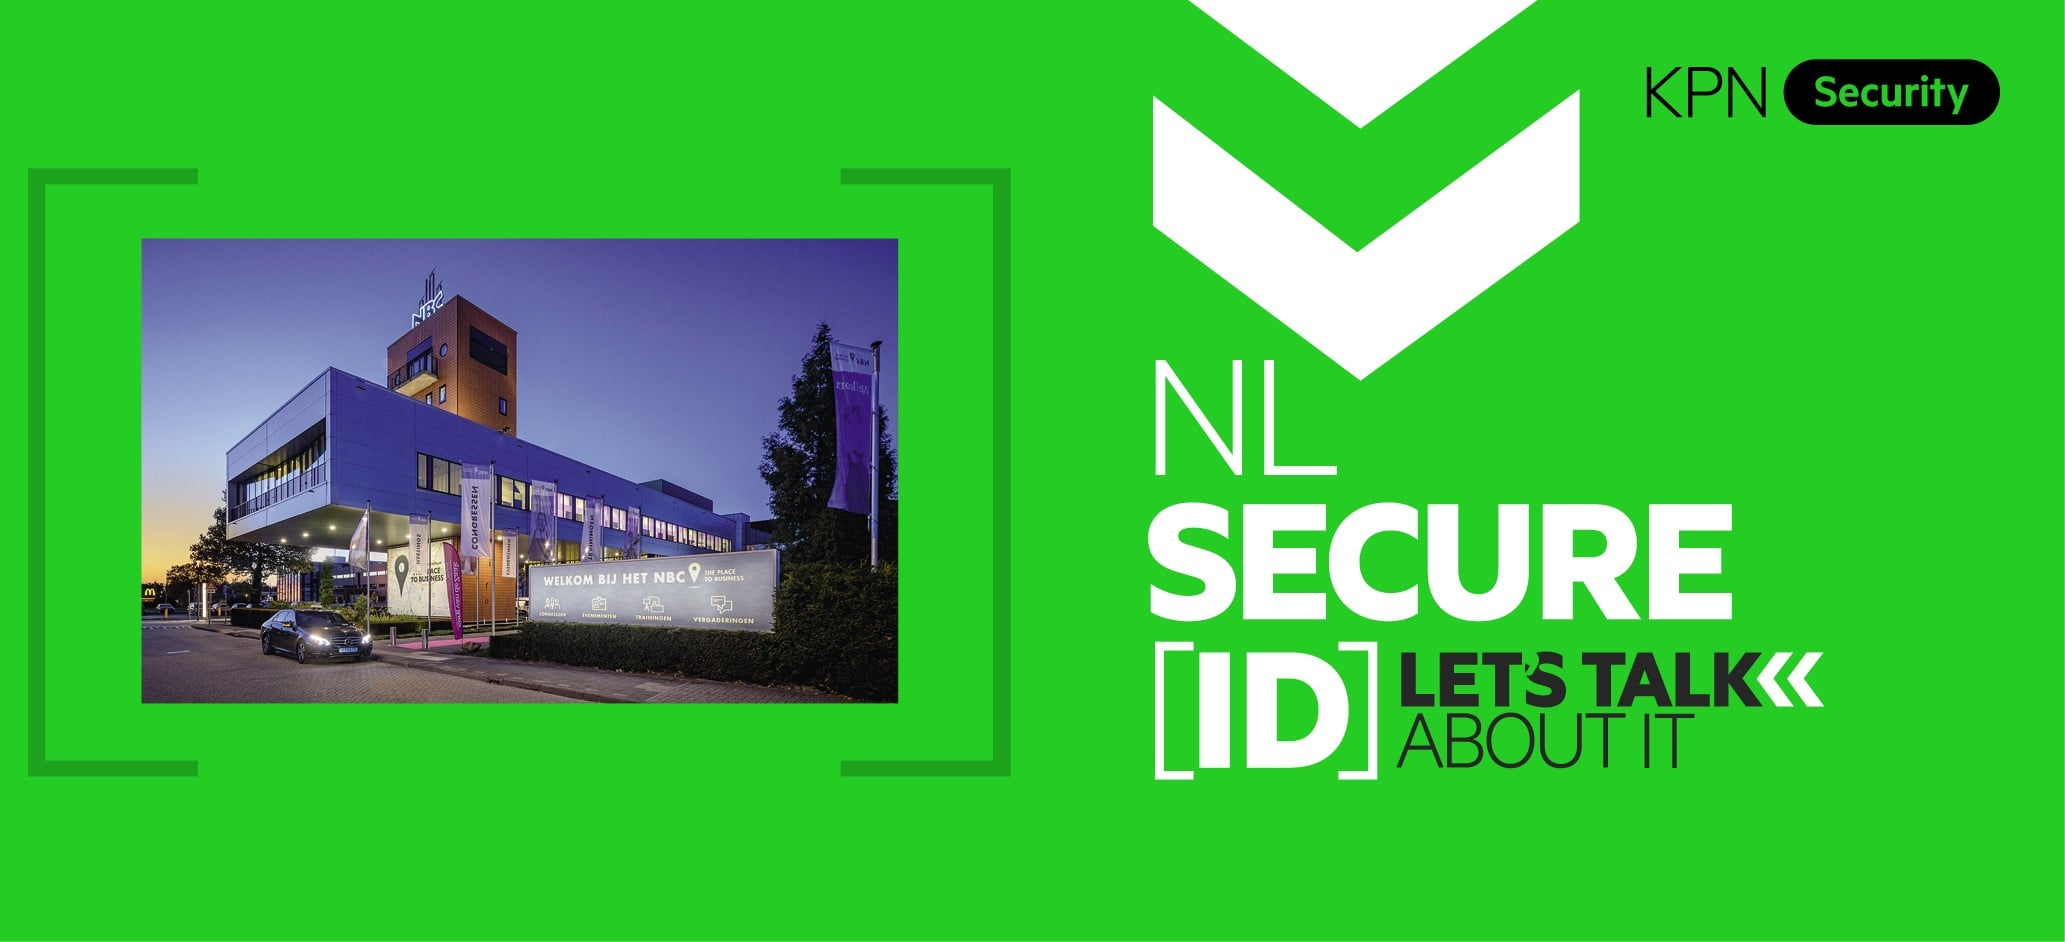 NL Secure id